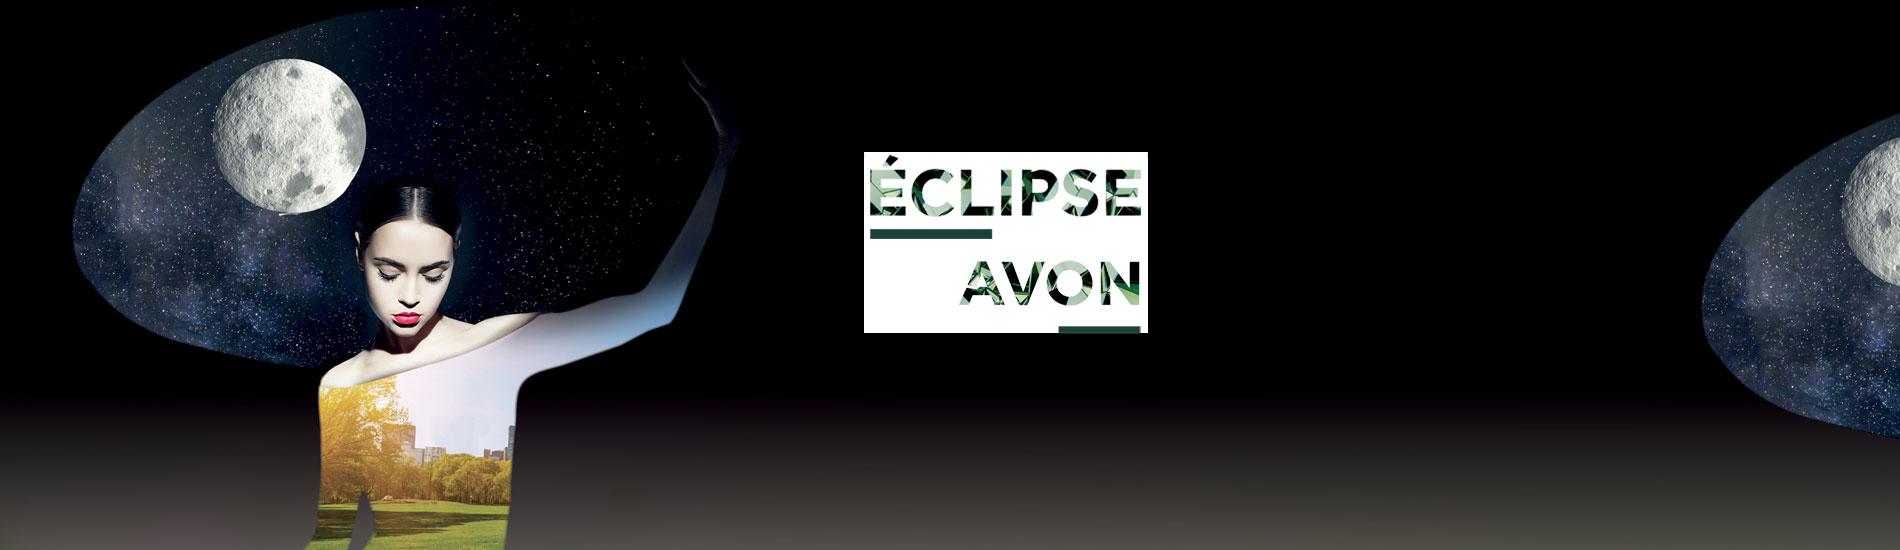 ideom-eclipse-75